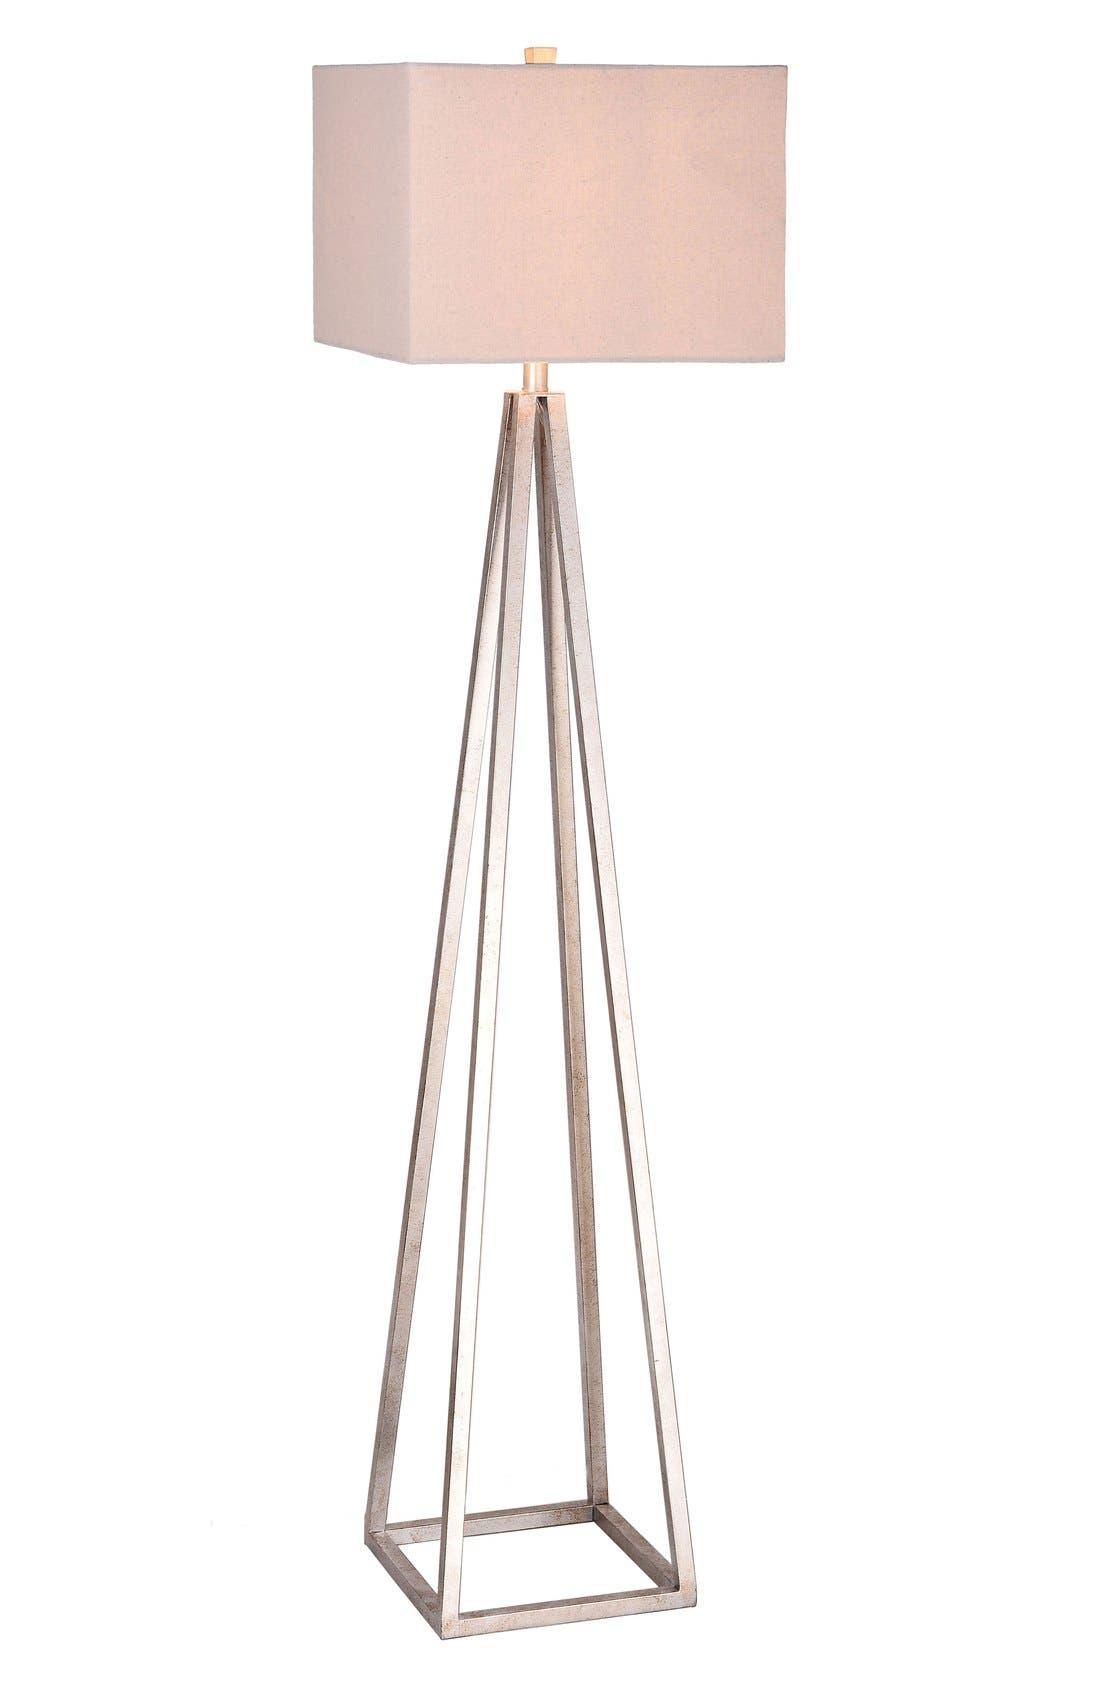 JAlexander Carrie Open Caged Metal Floor Lamp,                             Main thumbnail 1, color,                             040